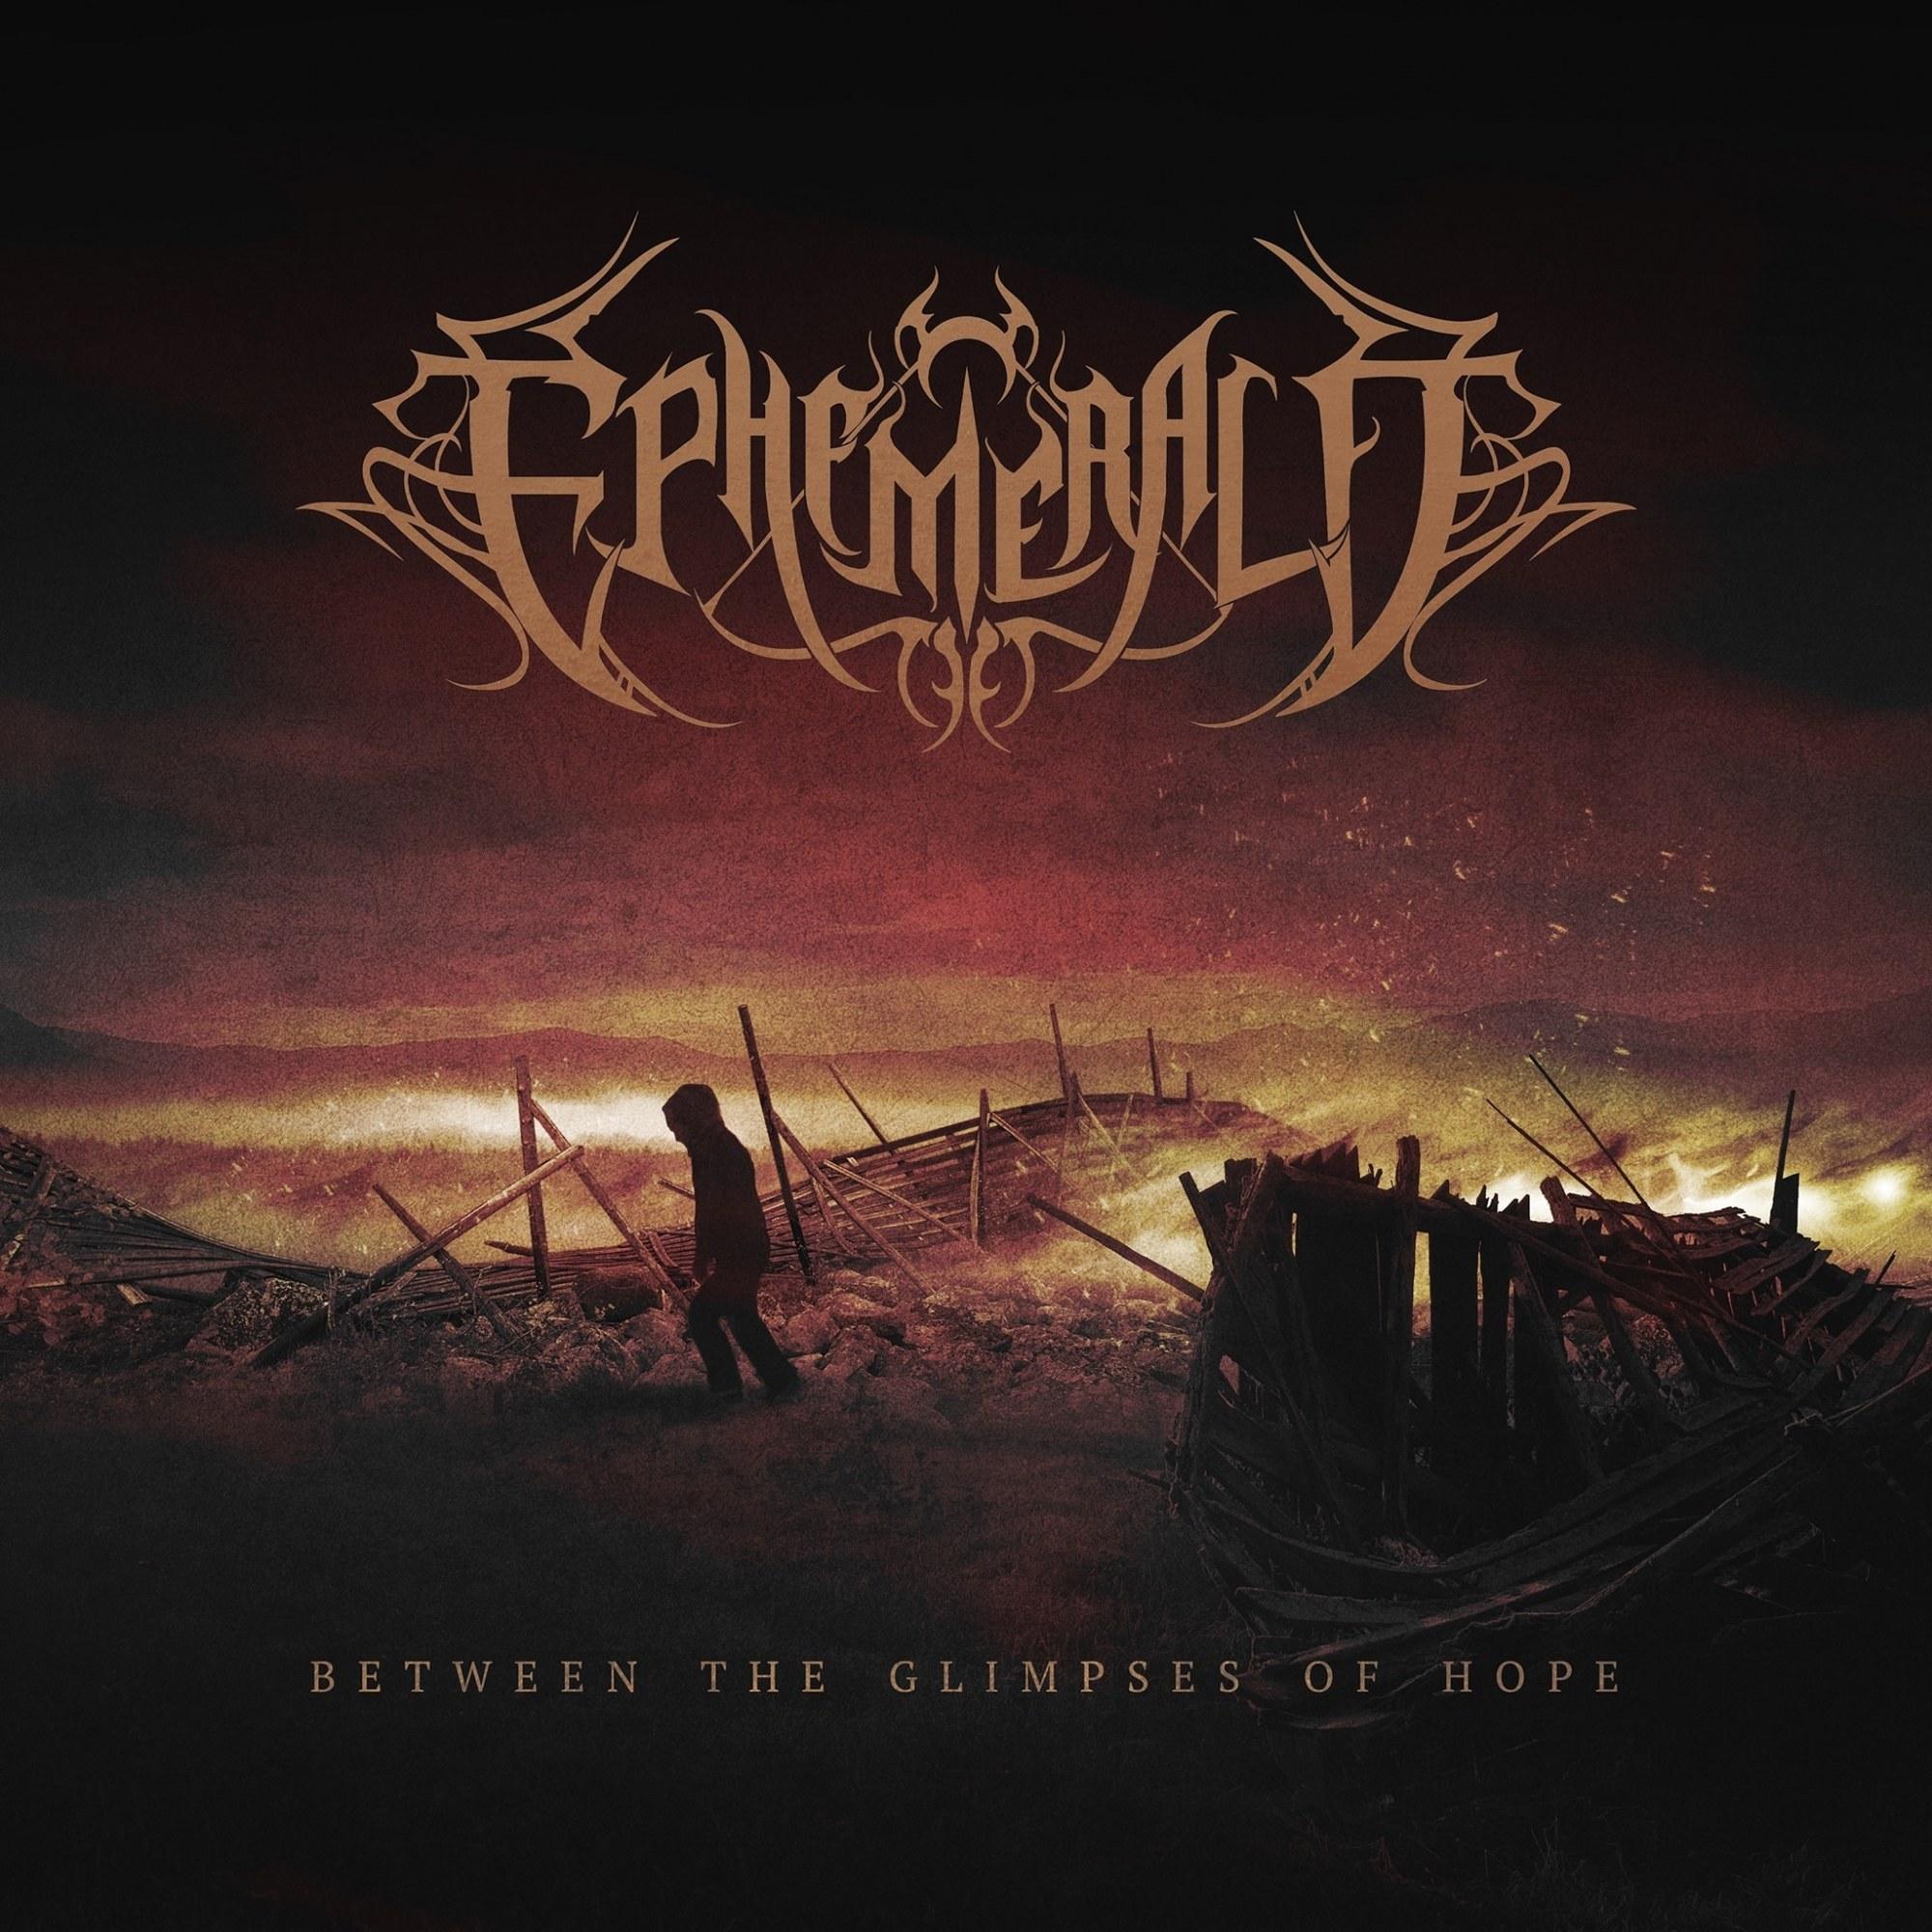 Ephemerald - Between the Glimpses of Hope